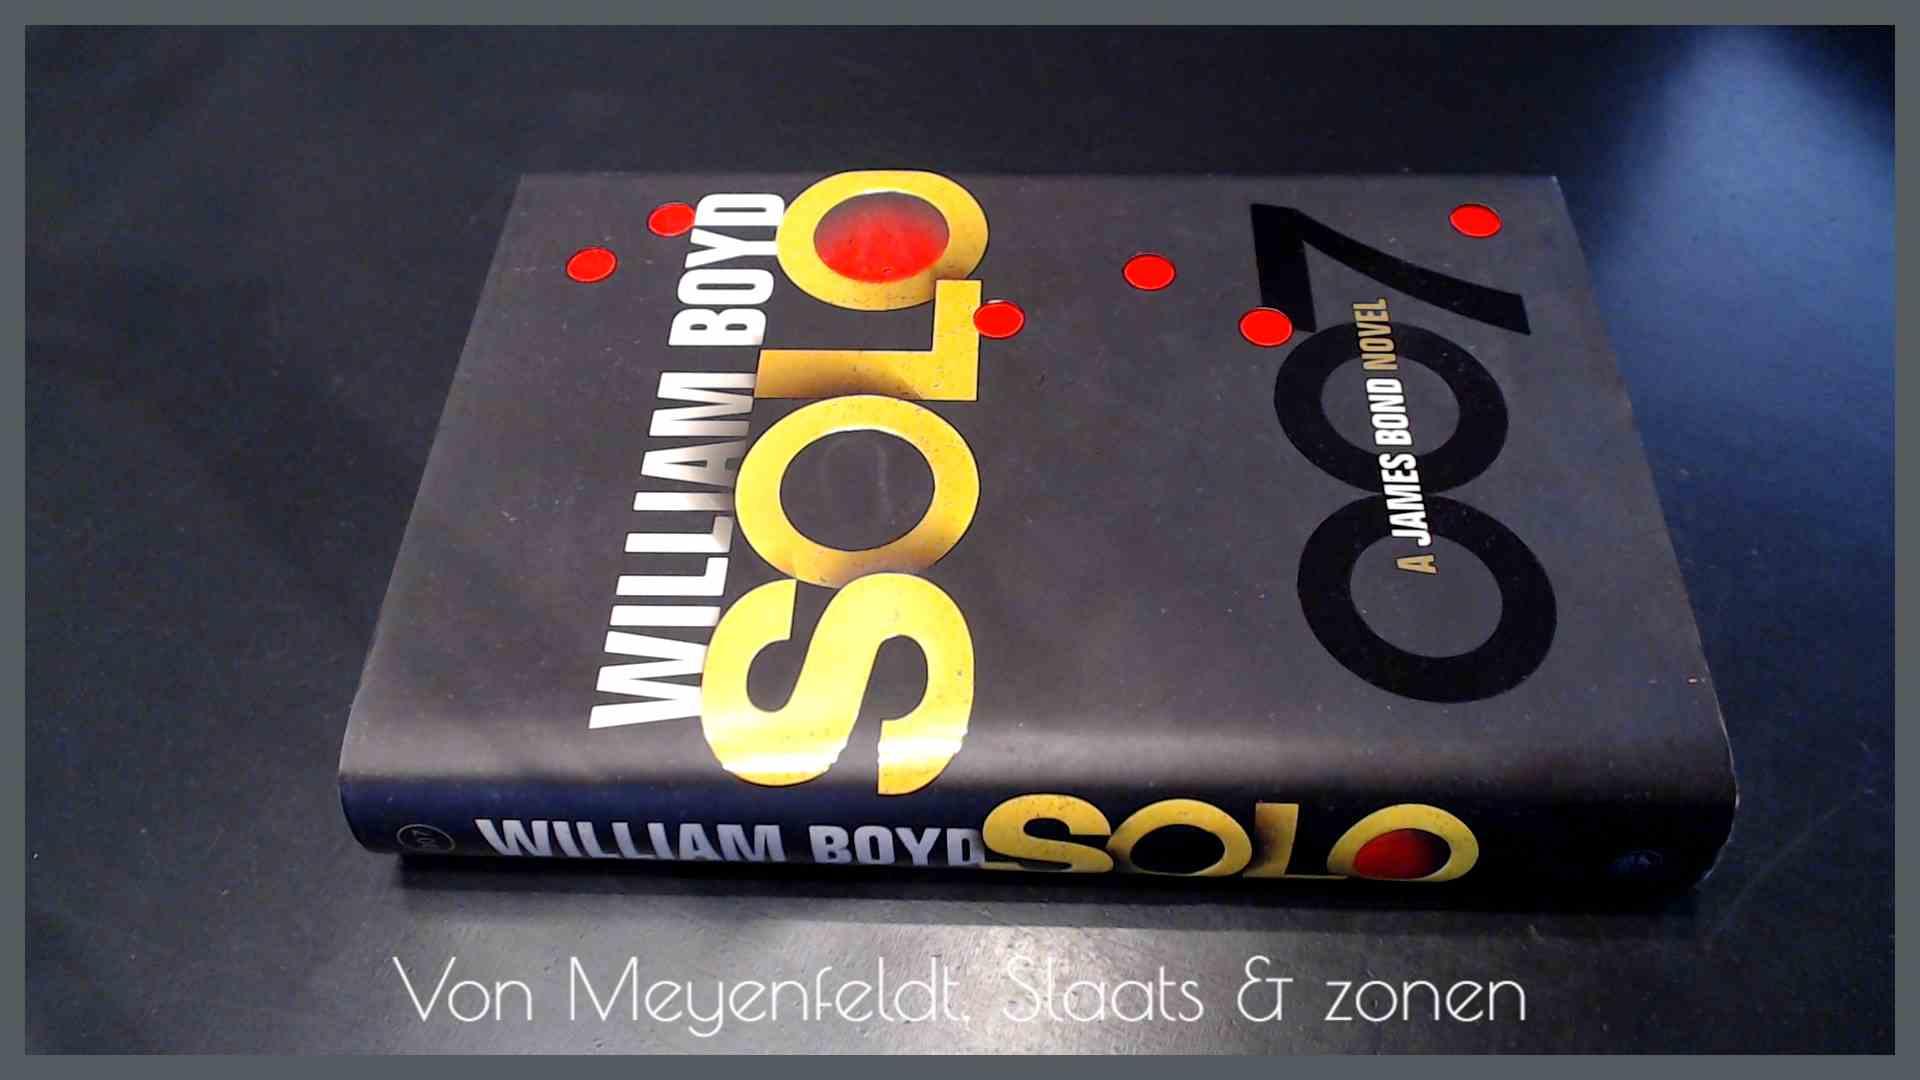 BOYD, WILLIAM - Solo